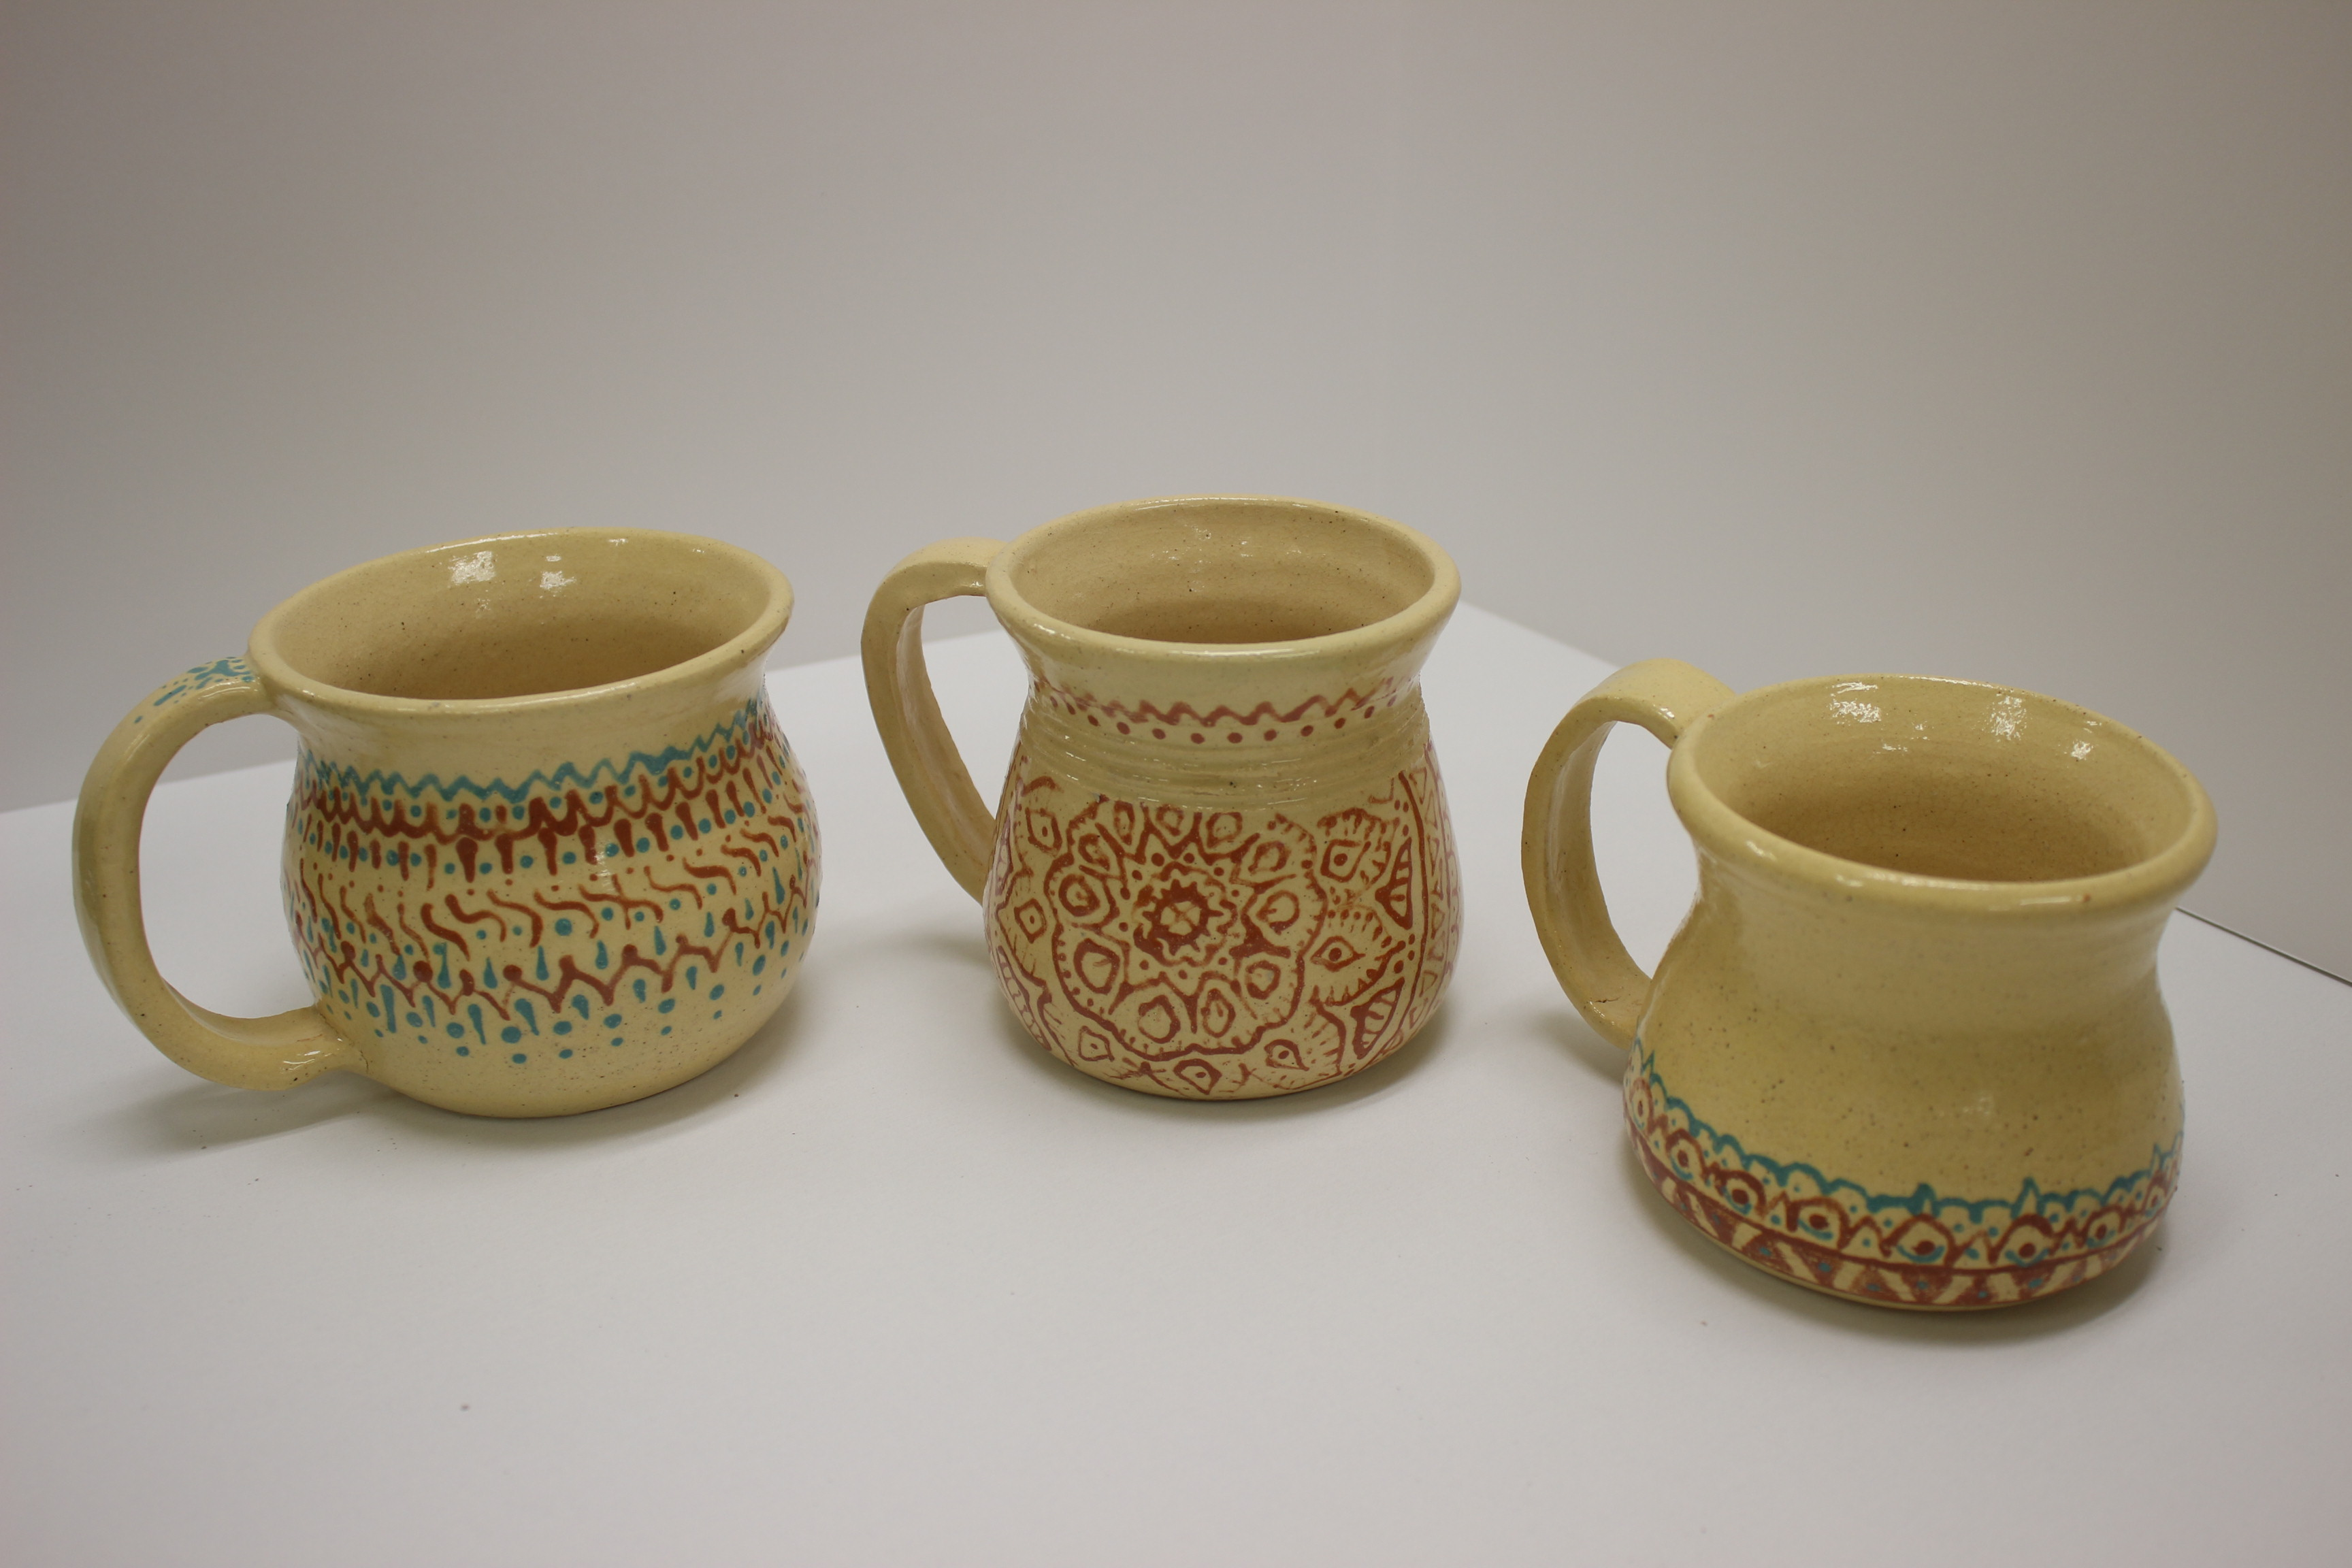 Set of 3 Tea Mugs